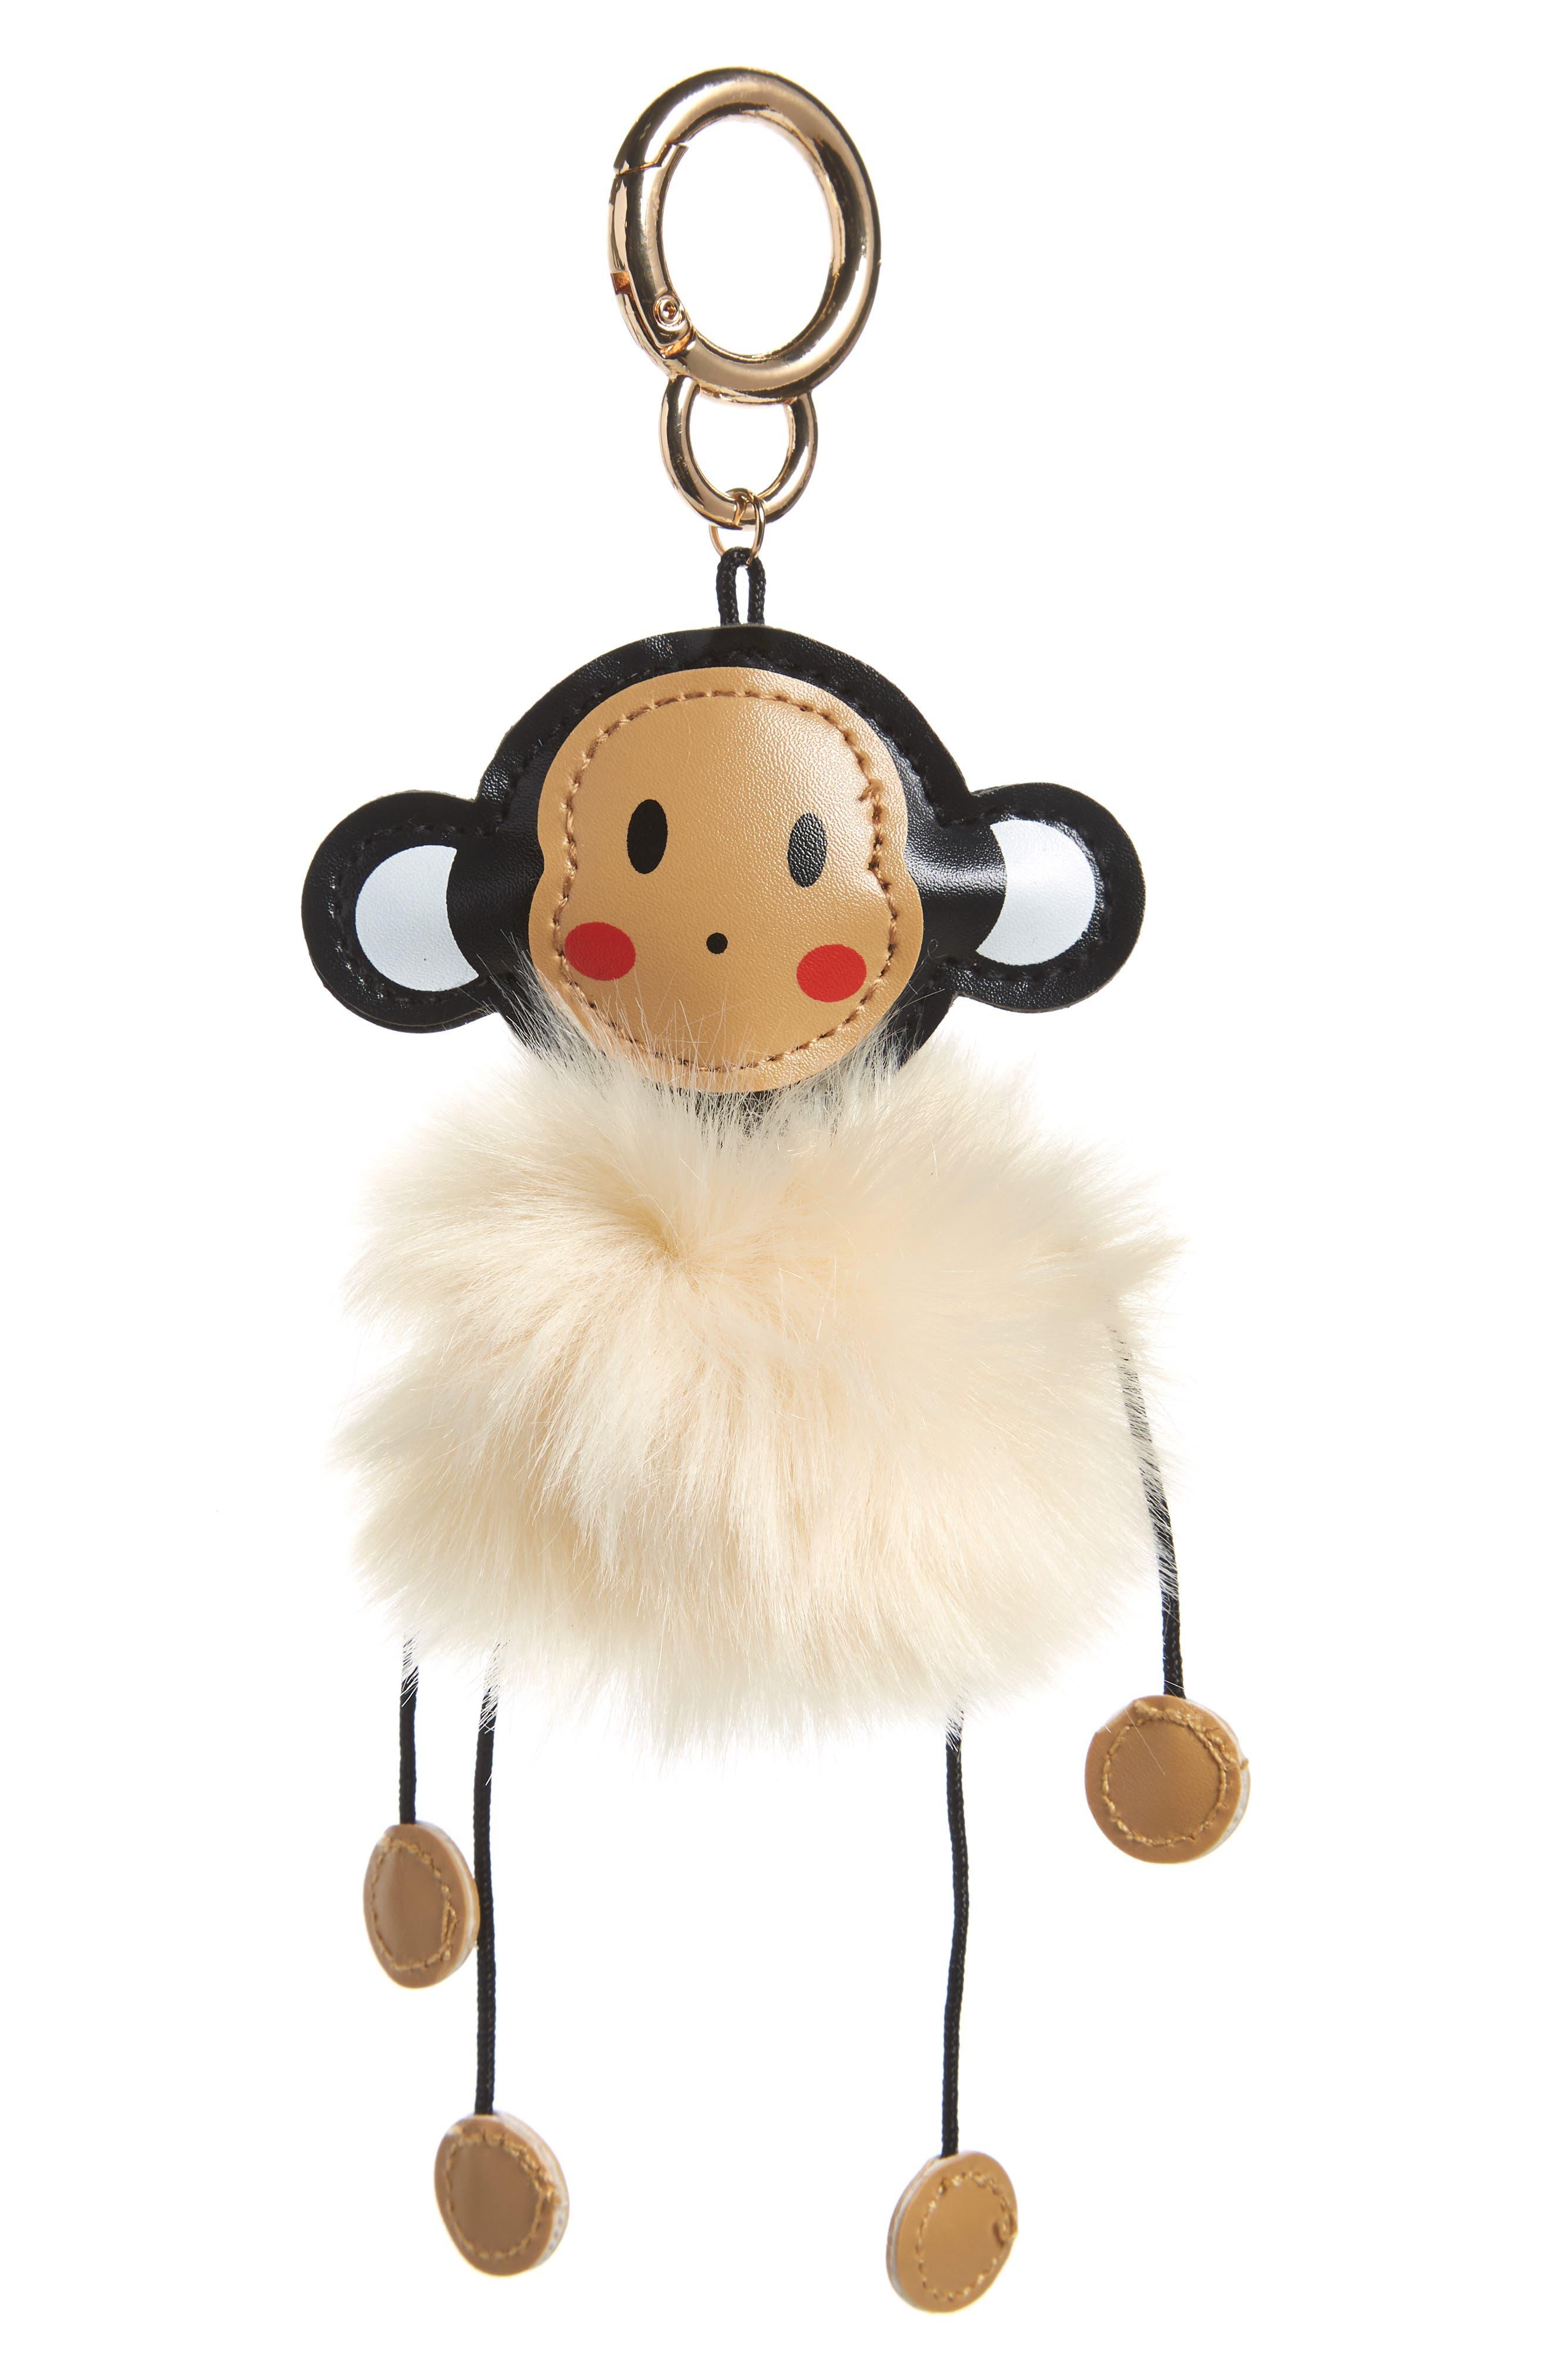 Faux Fur Monkey Bag Charm,                             Main thumbnail 1, color,                             270